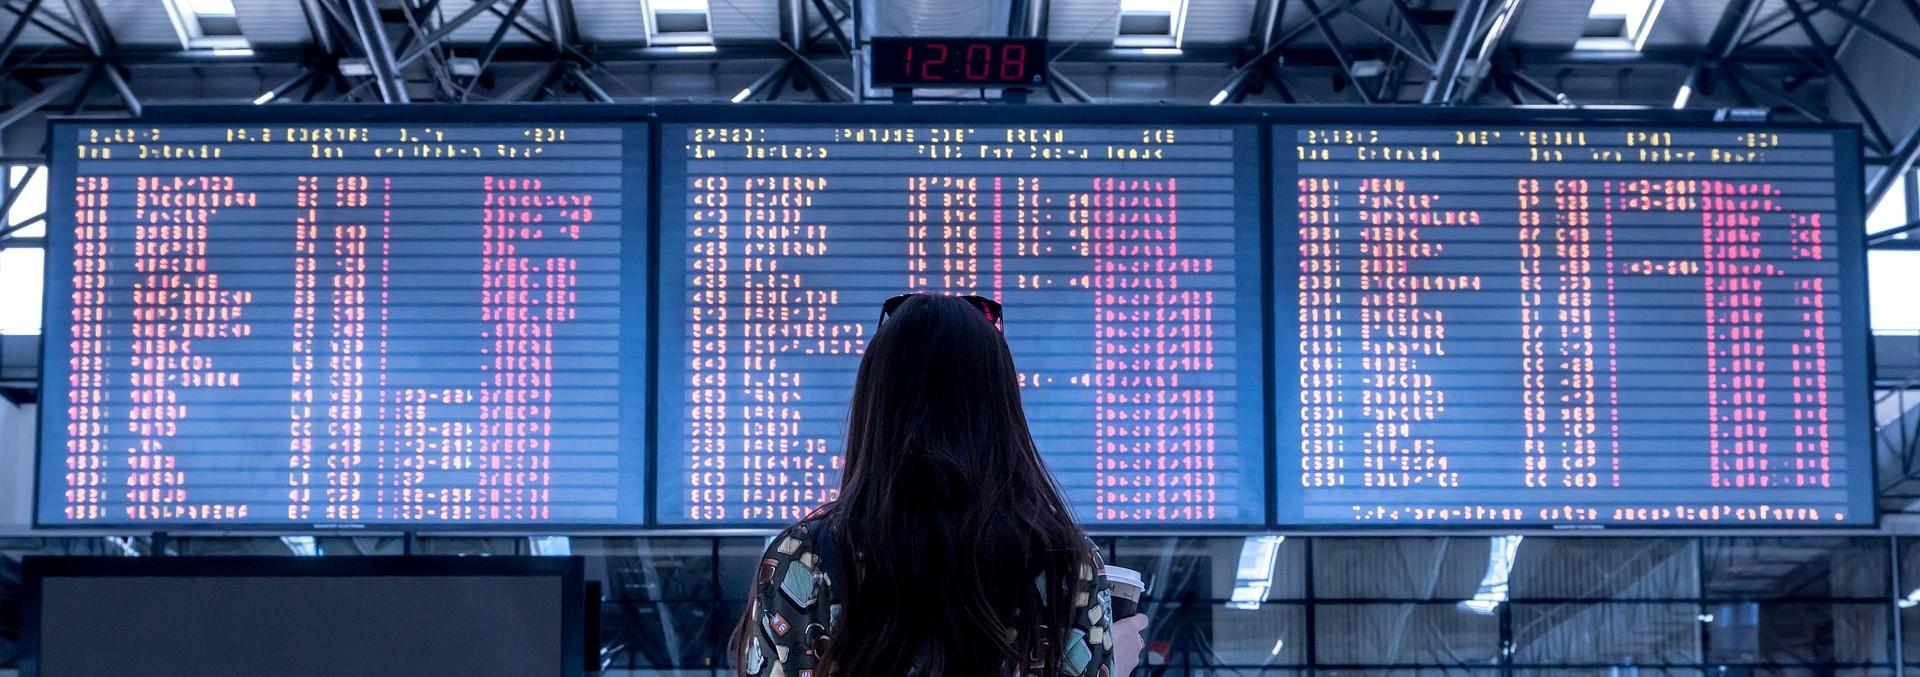 Viajes - Aeropuerto